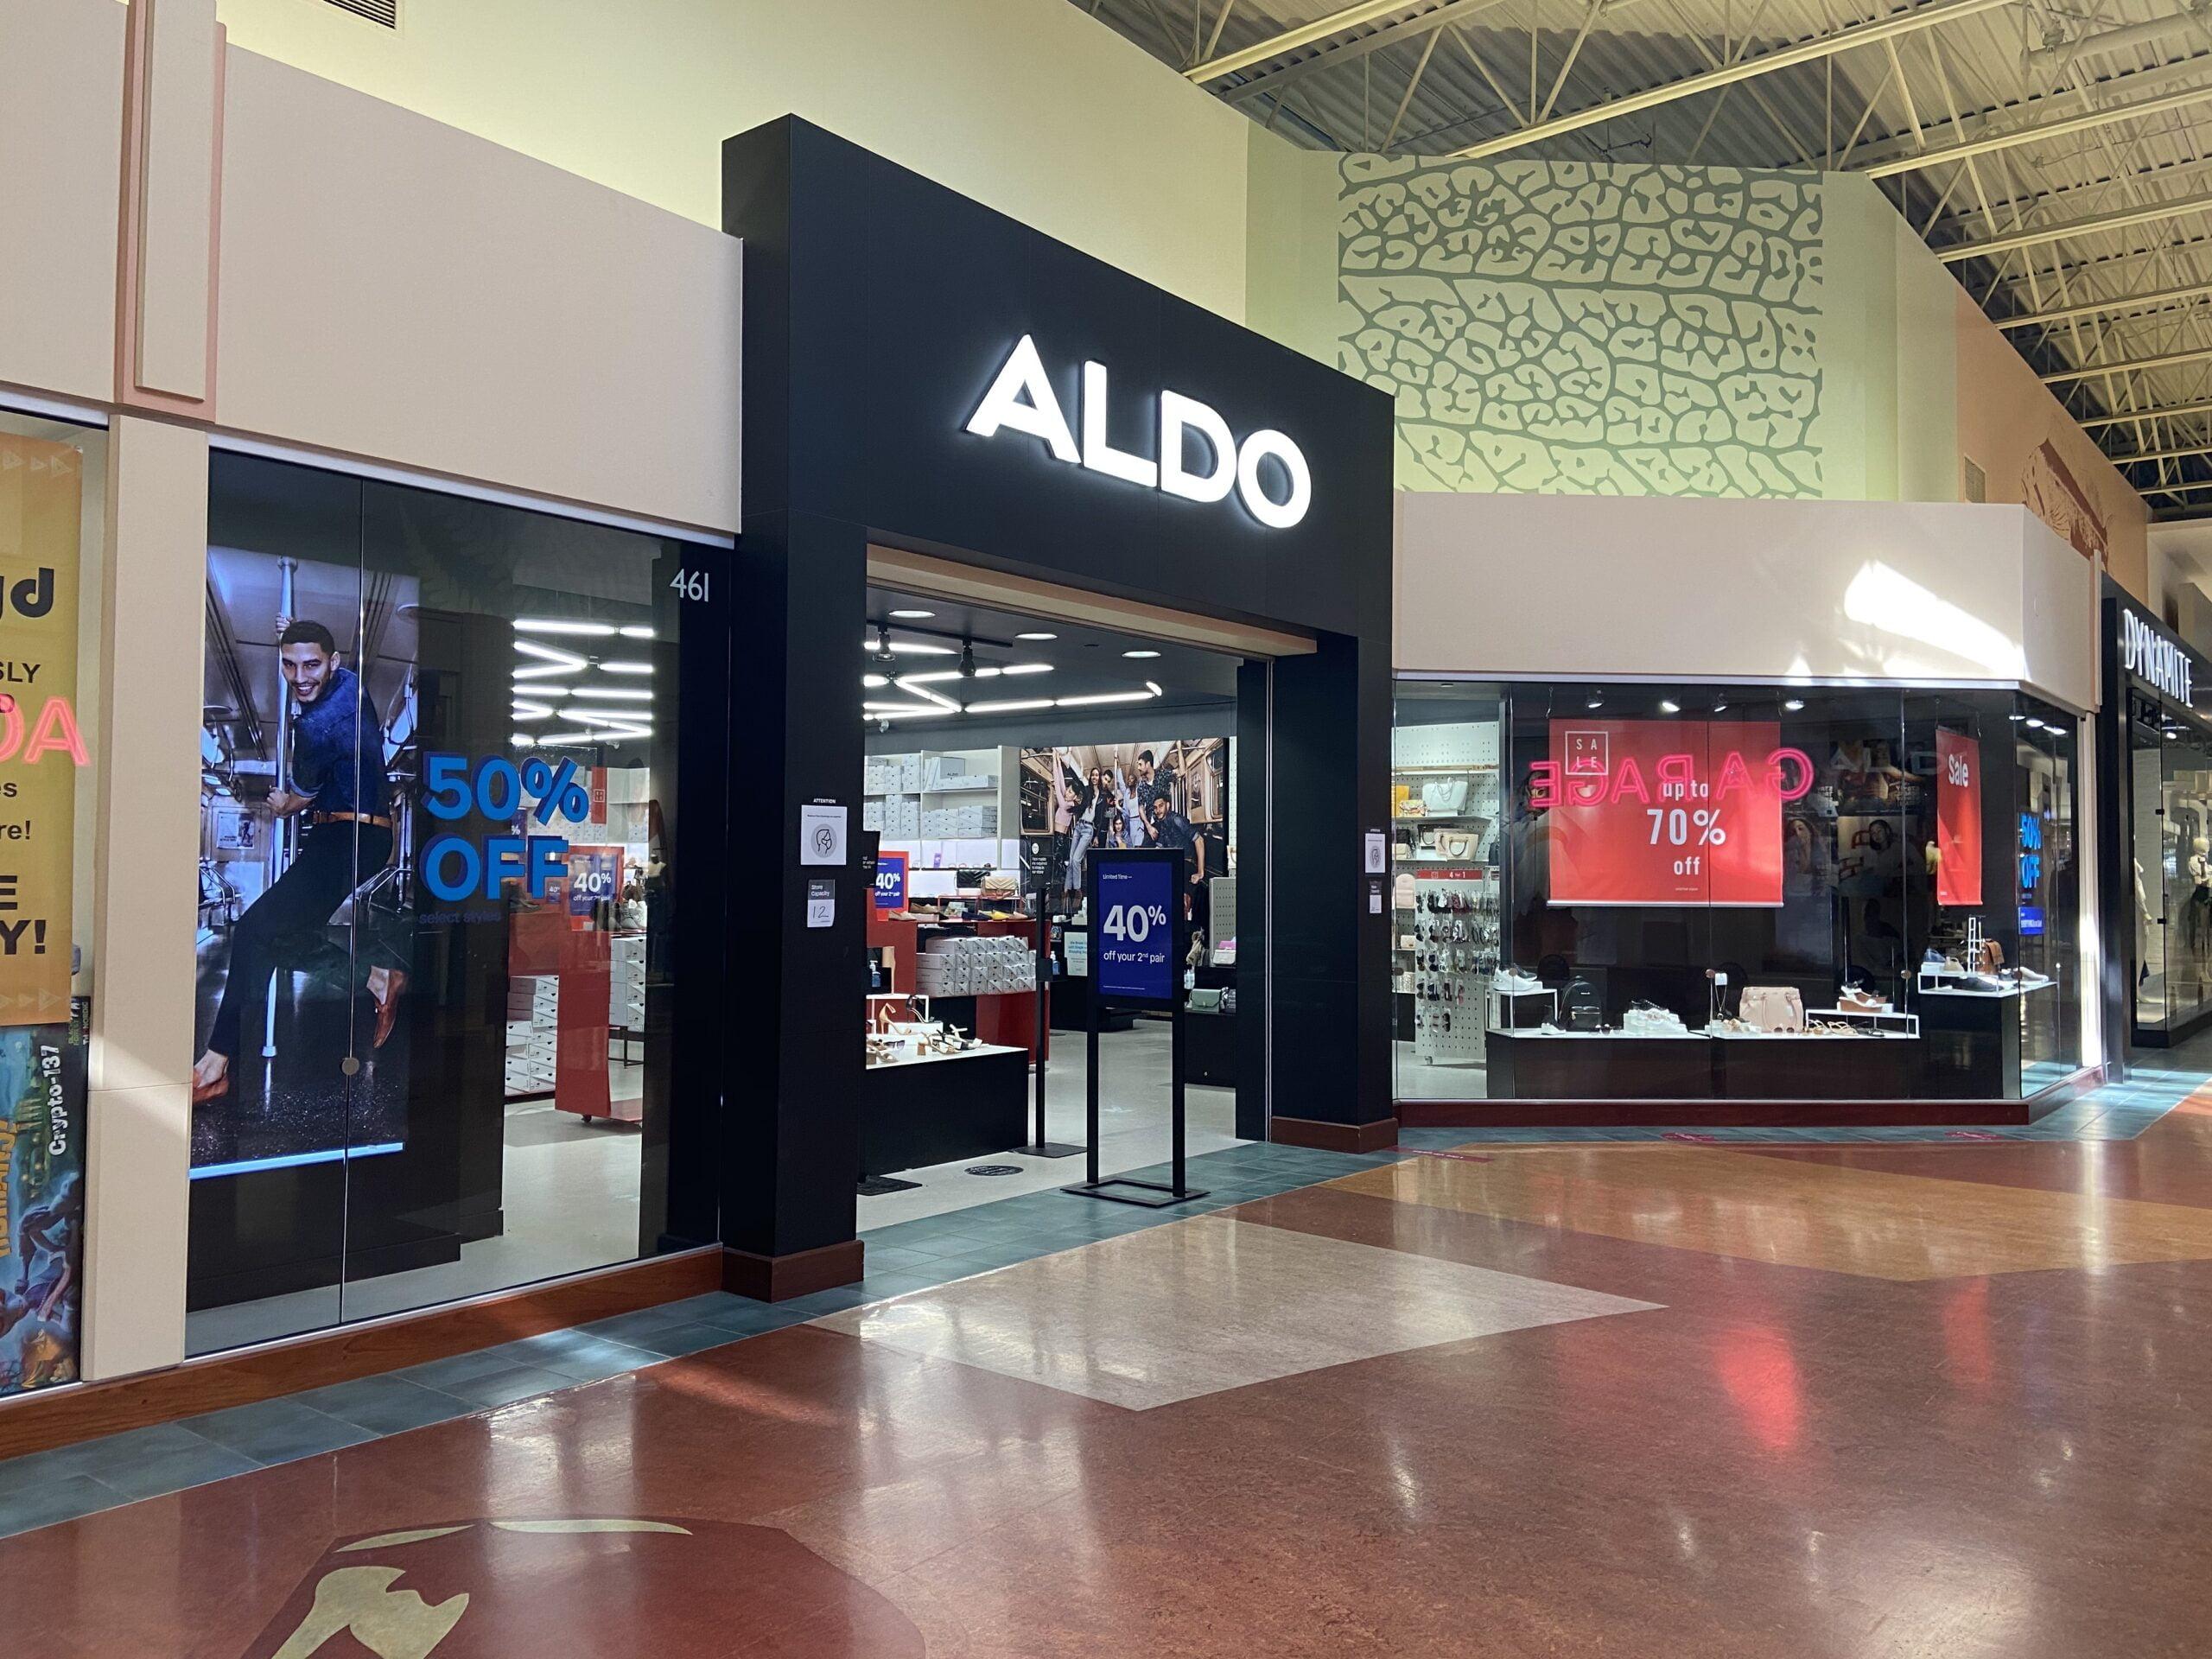 Aldo at CrossIron Mills